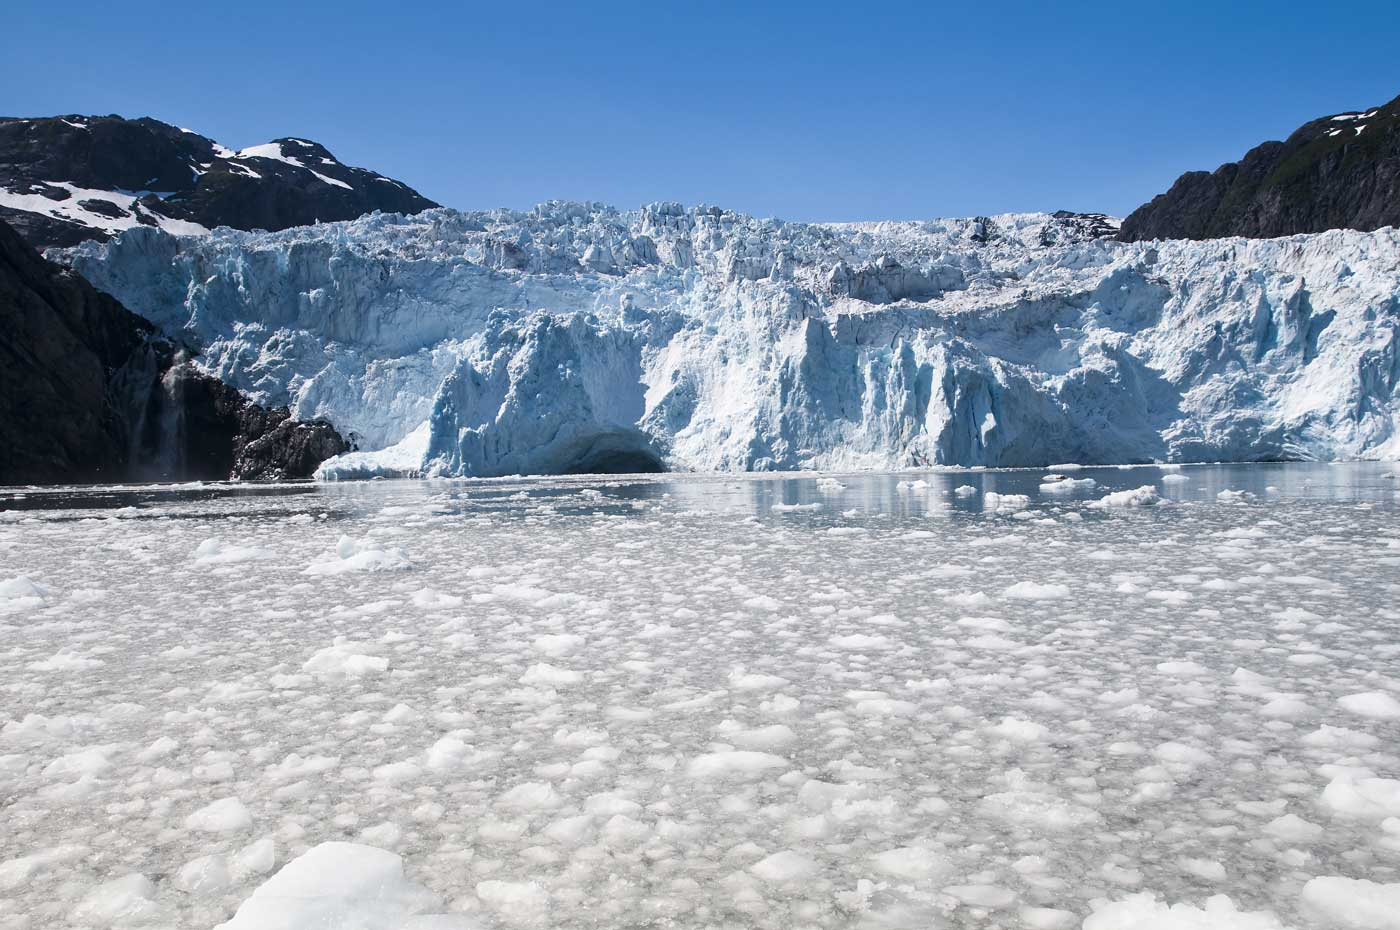 Kenai Fjords National Park Presents Some Of The Best Of Alaska